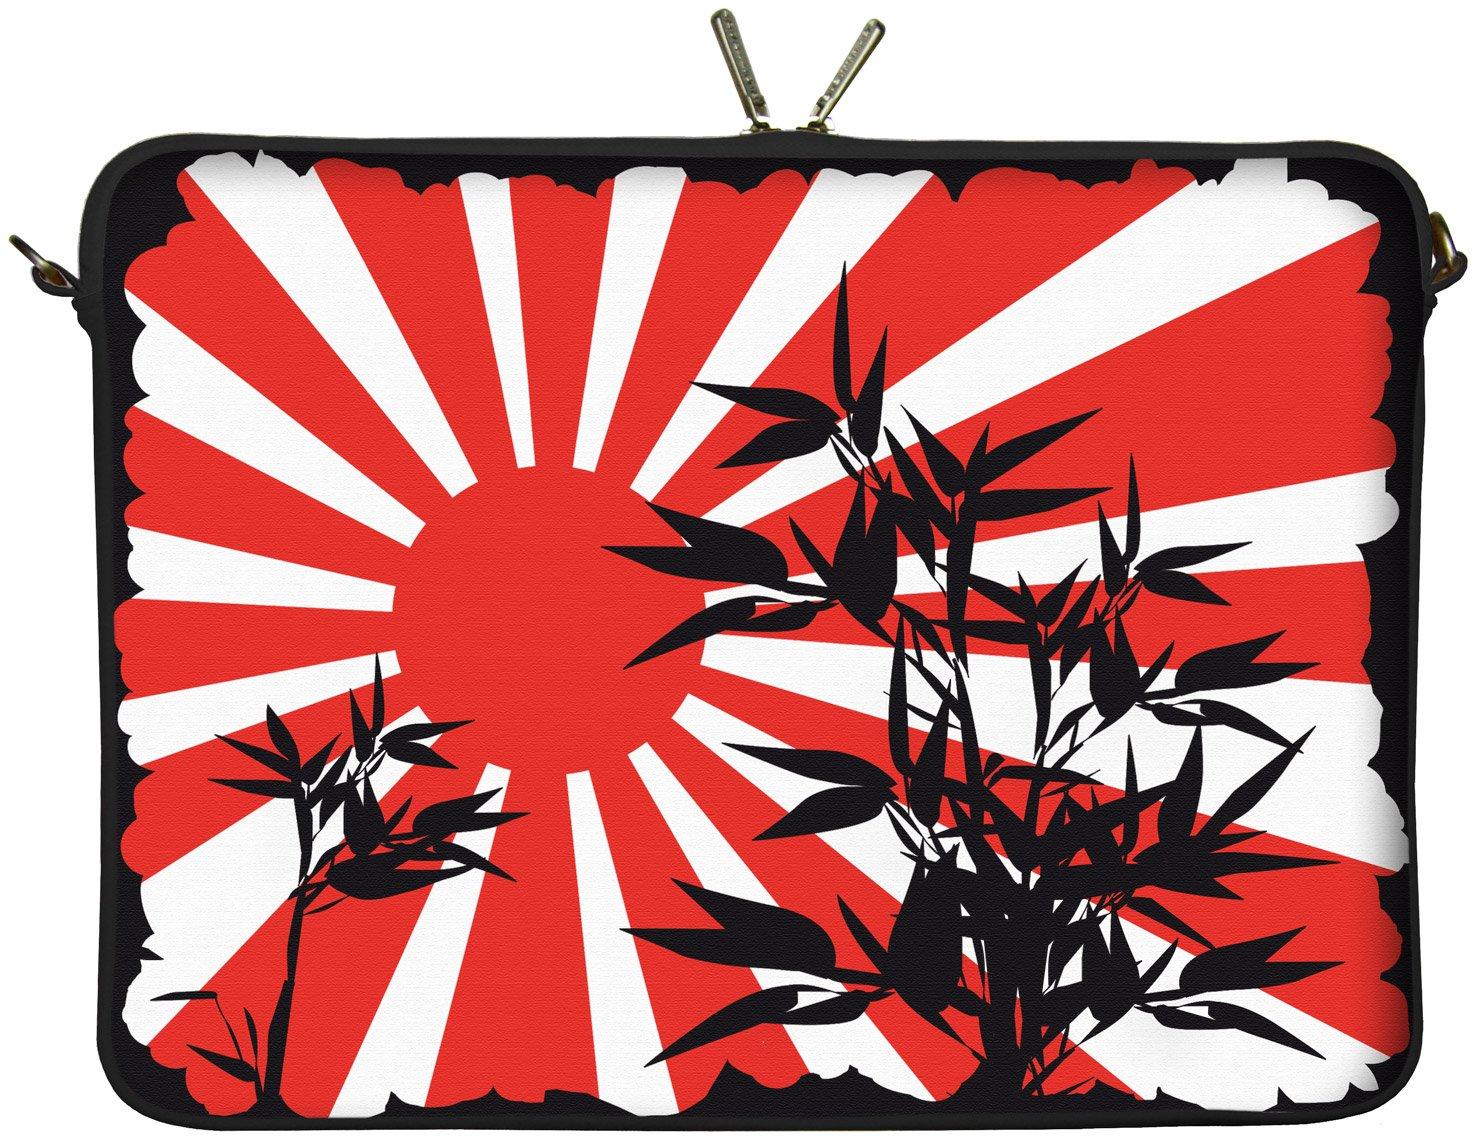 Digittrade LS150-13 Bamboo MacBook Sleeve Laptop neopren case custodia portatile borsa involucro pr